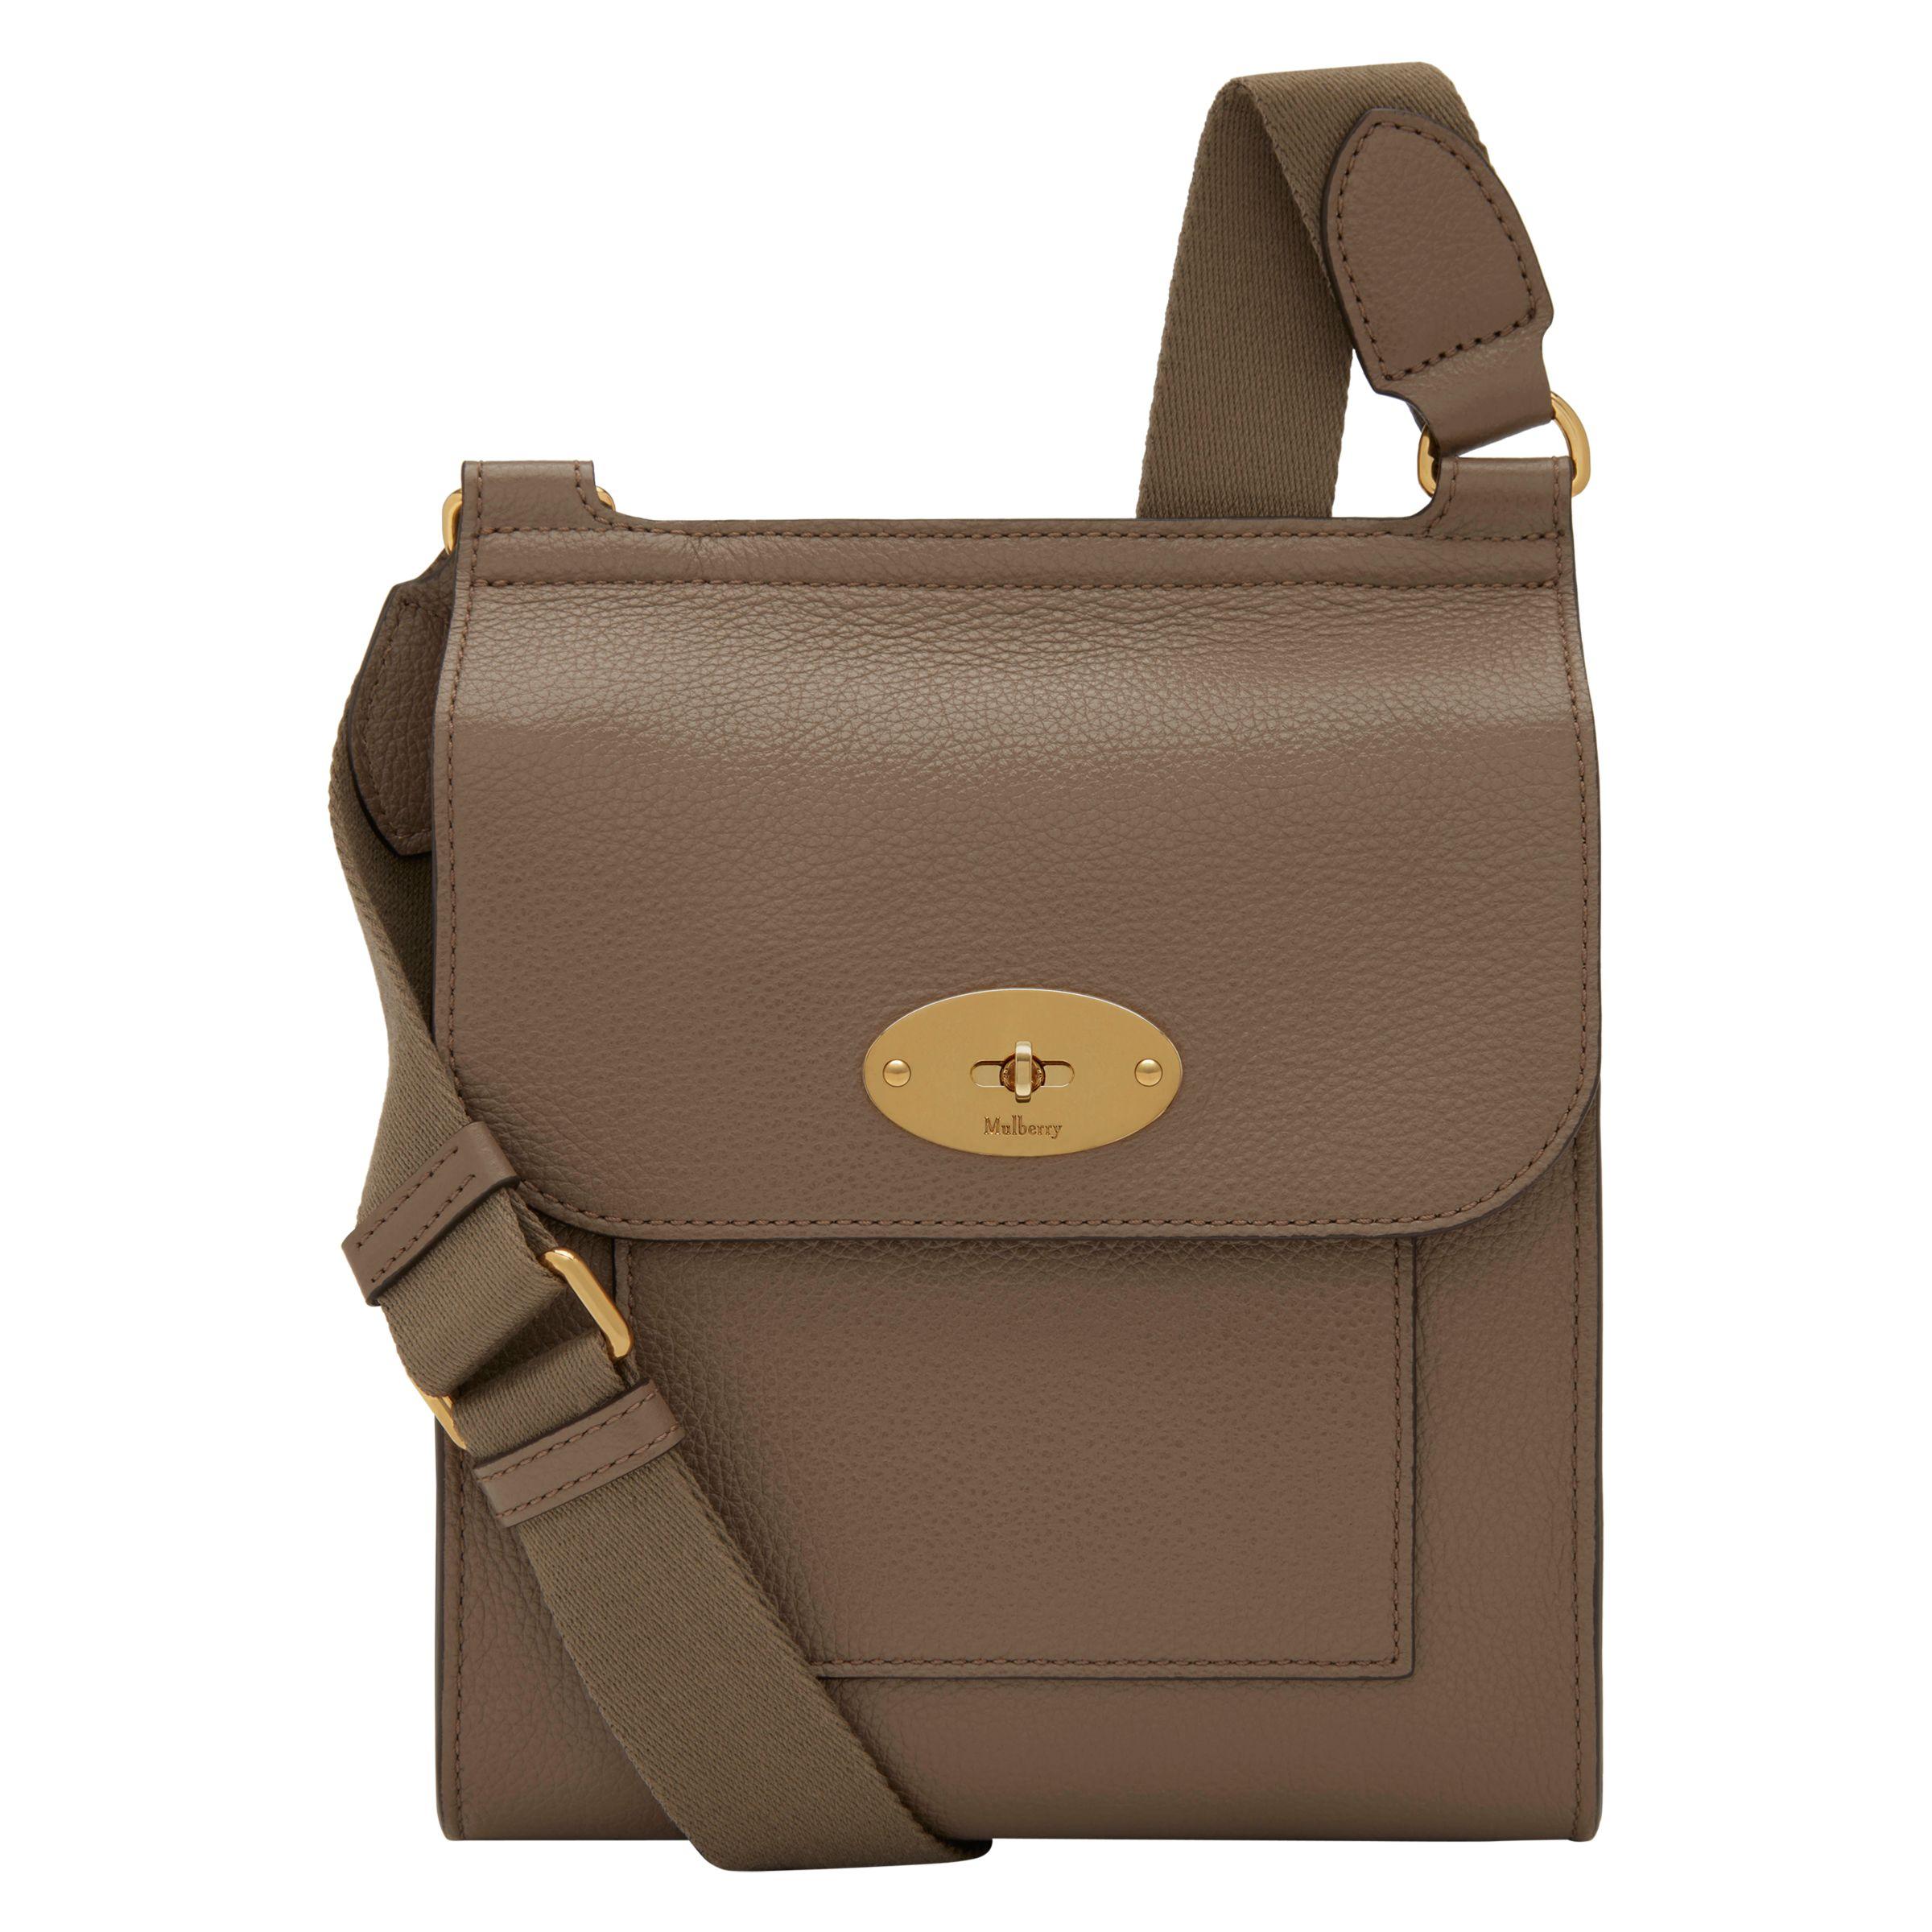 857d886537 ... buy mulberry antony small classic grain leather small satchel at john  lewis partners 1946c de27e ...